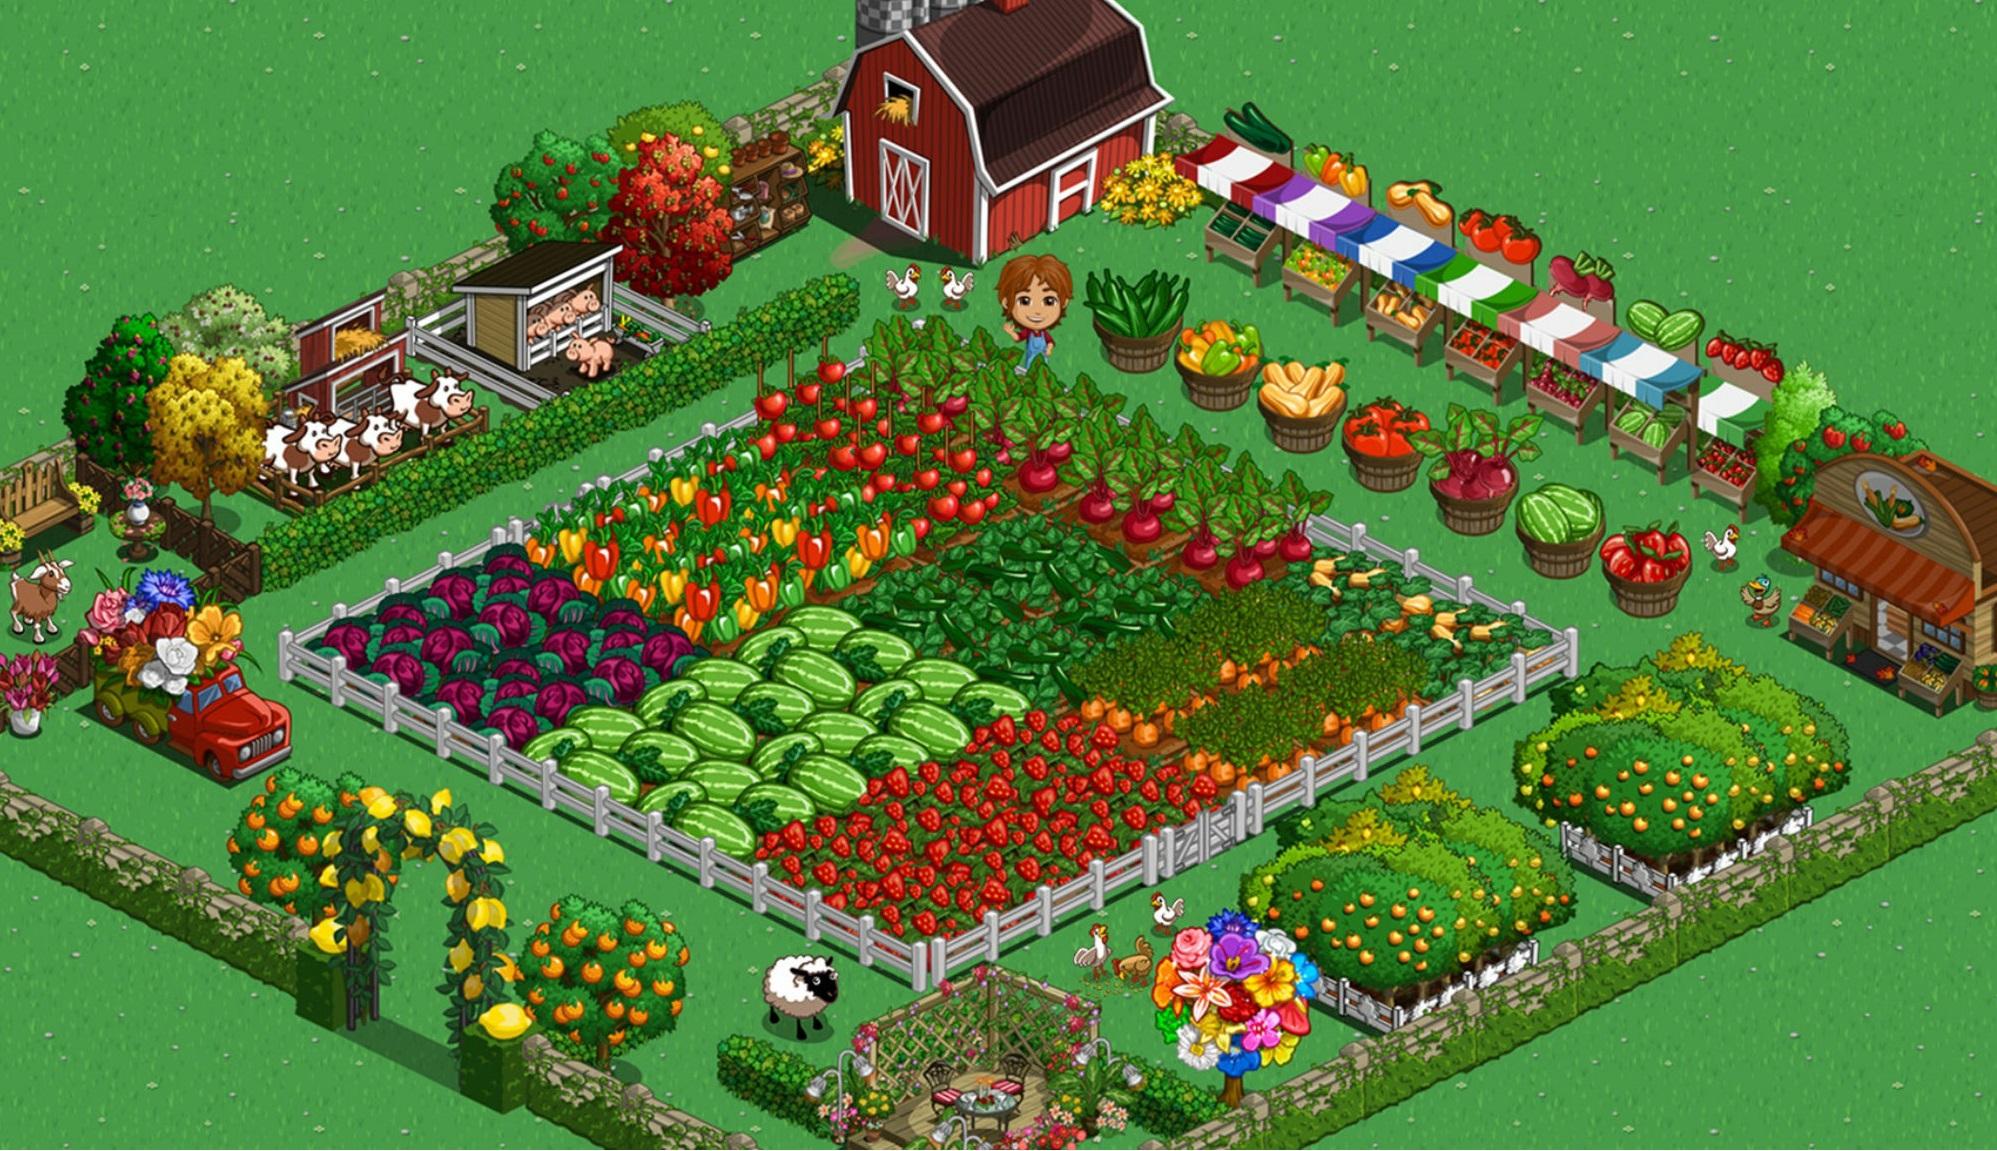 Zynga's legendary FarmVille to close after a decade of success screenshot